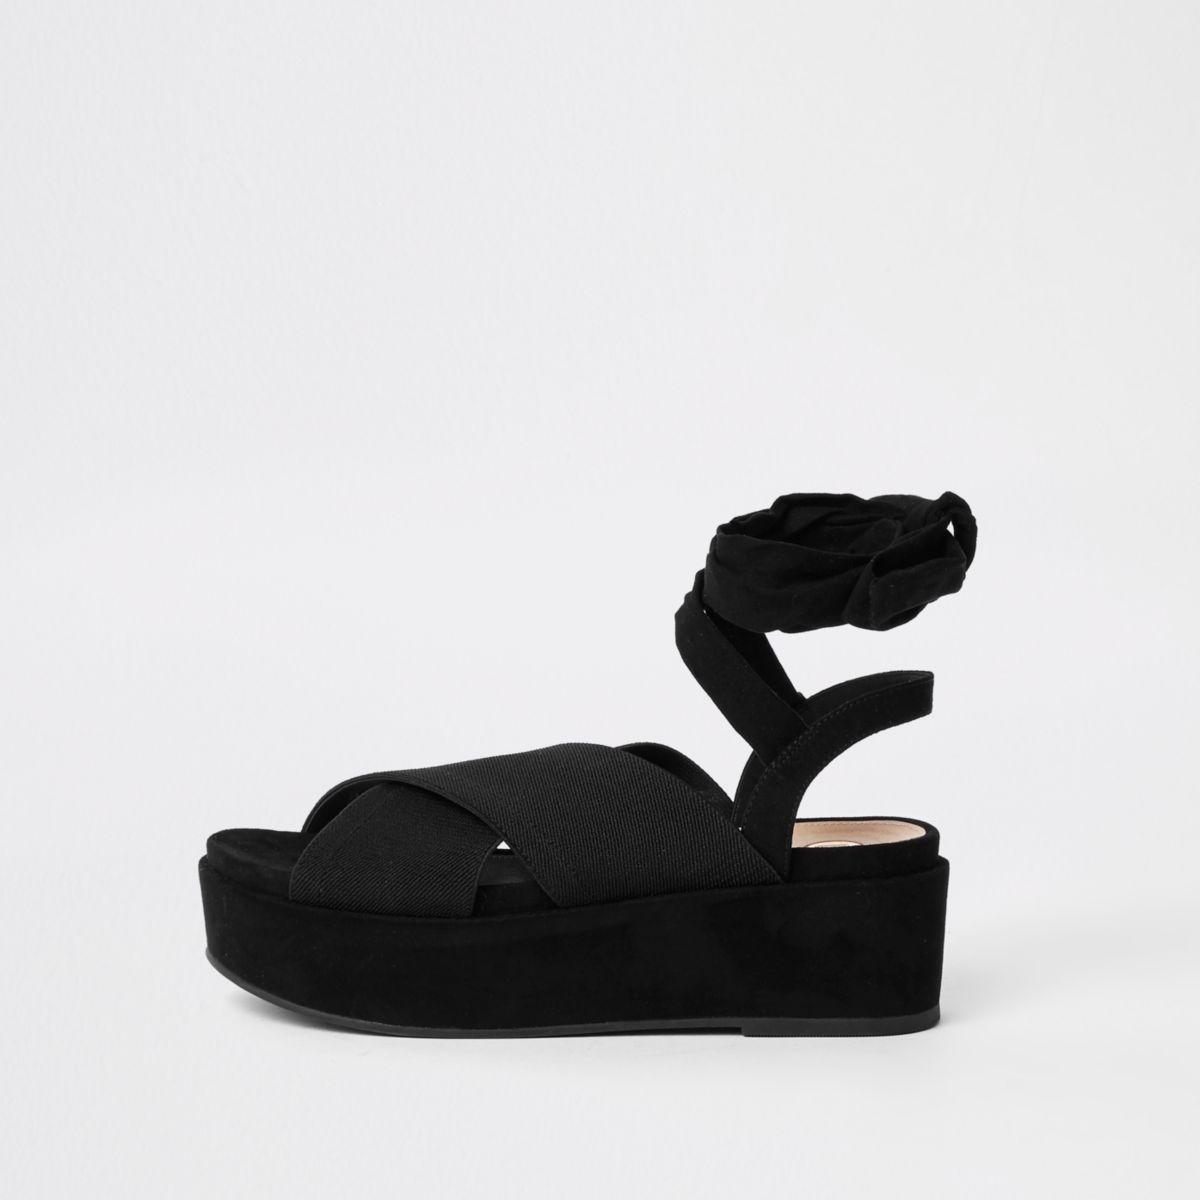 Black ankle tie platform heel sandals